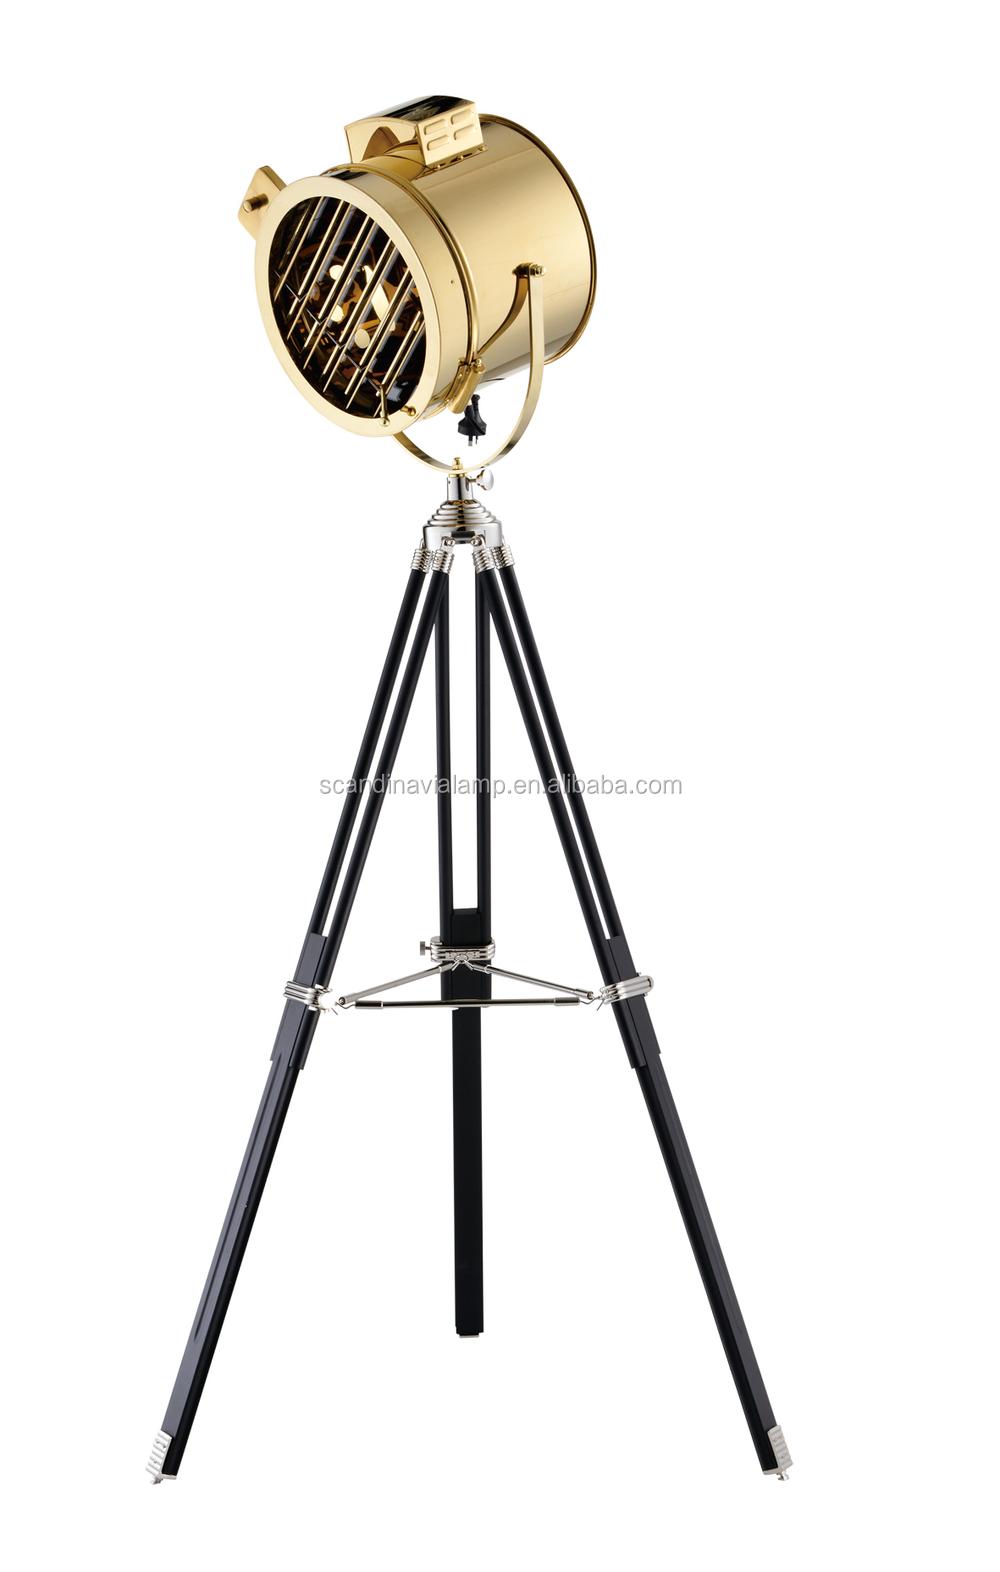 Vintage Retro Industrial Royal Master Sealight Floor Lamp